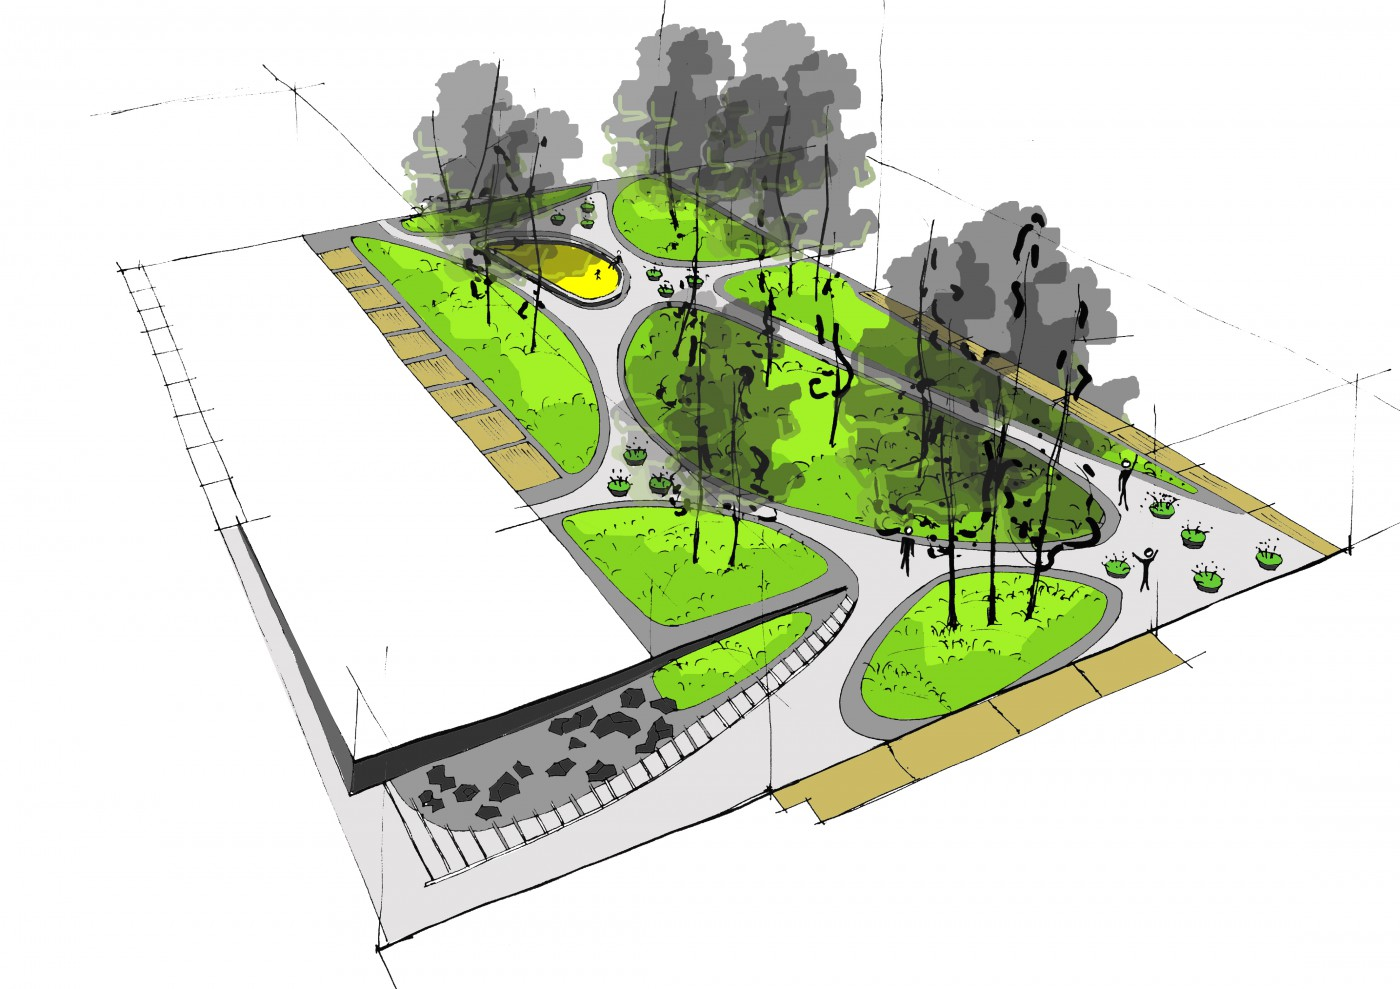 buro-sant-en-co-landschapsarchitectuur-Masira-Amsterdam-Hof-A